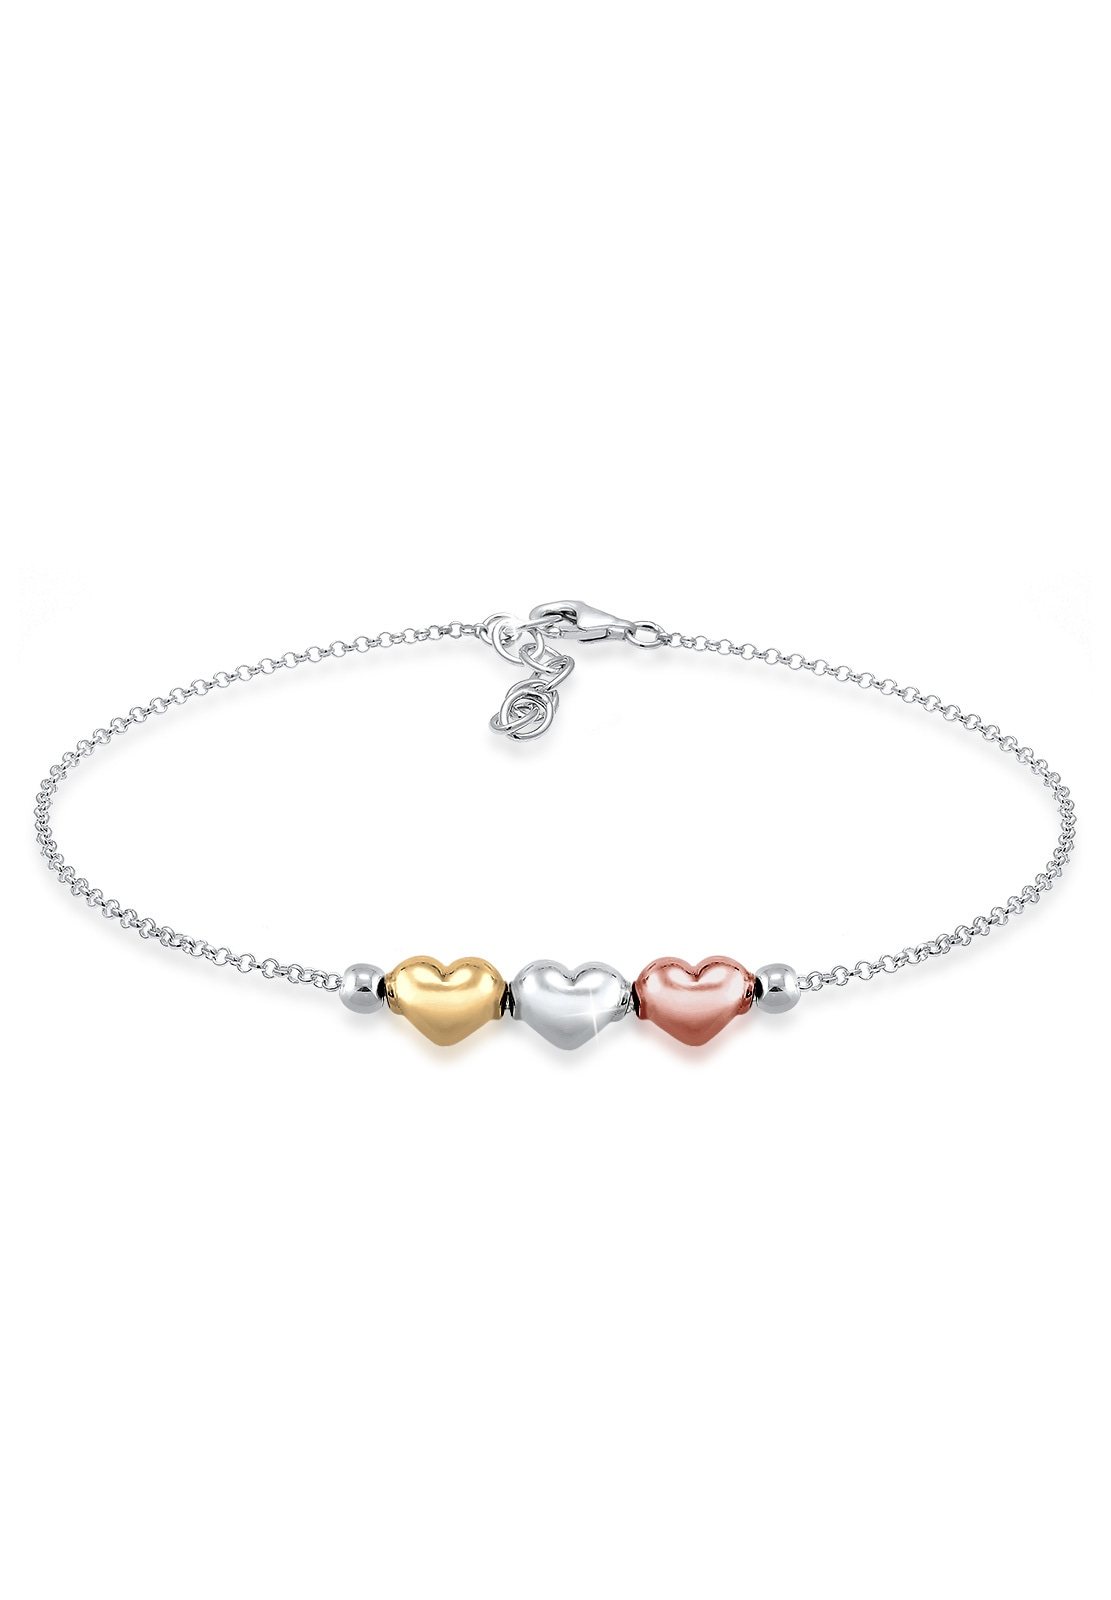 Elli Armband Herz Liebe Tri-Color 925 Sterling Silber | Schmuck > Armbänder > Silberarmbänder | Elli